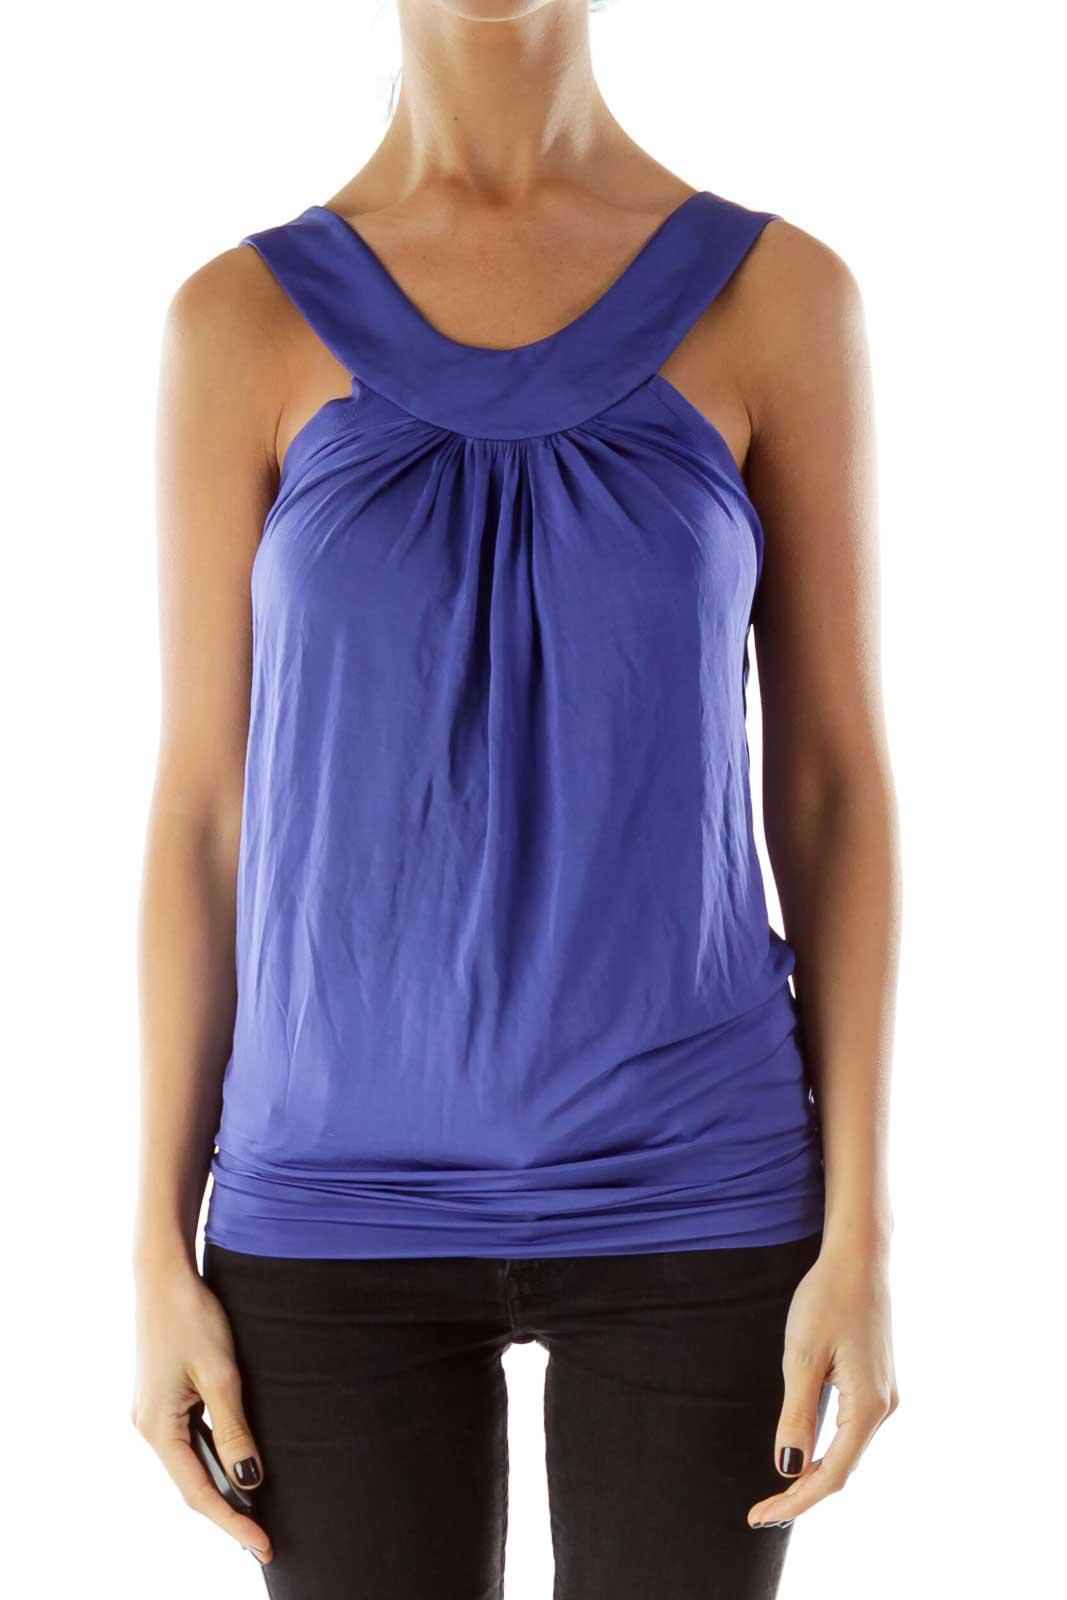 Purple Bandage Yoga Top